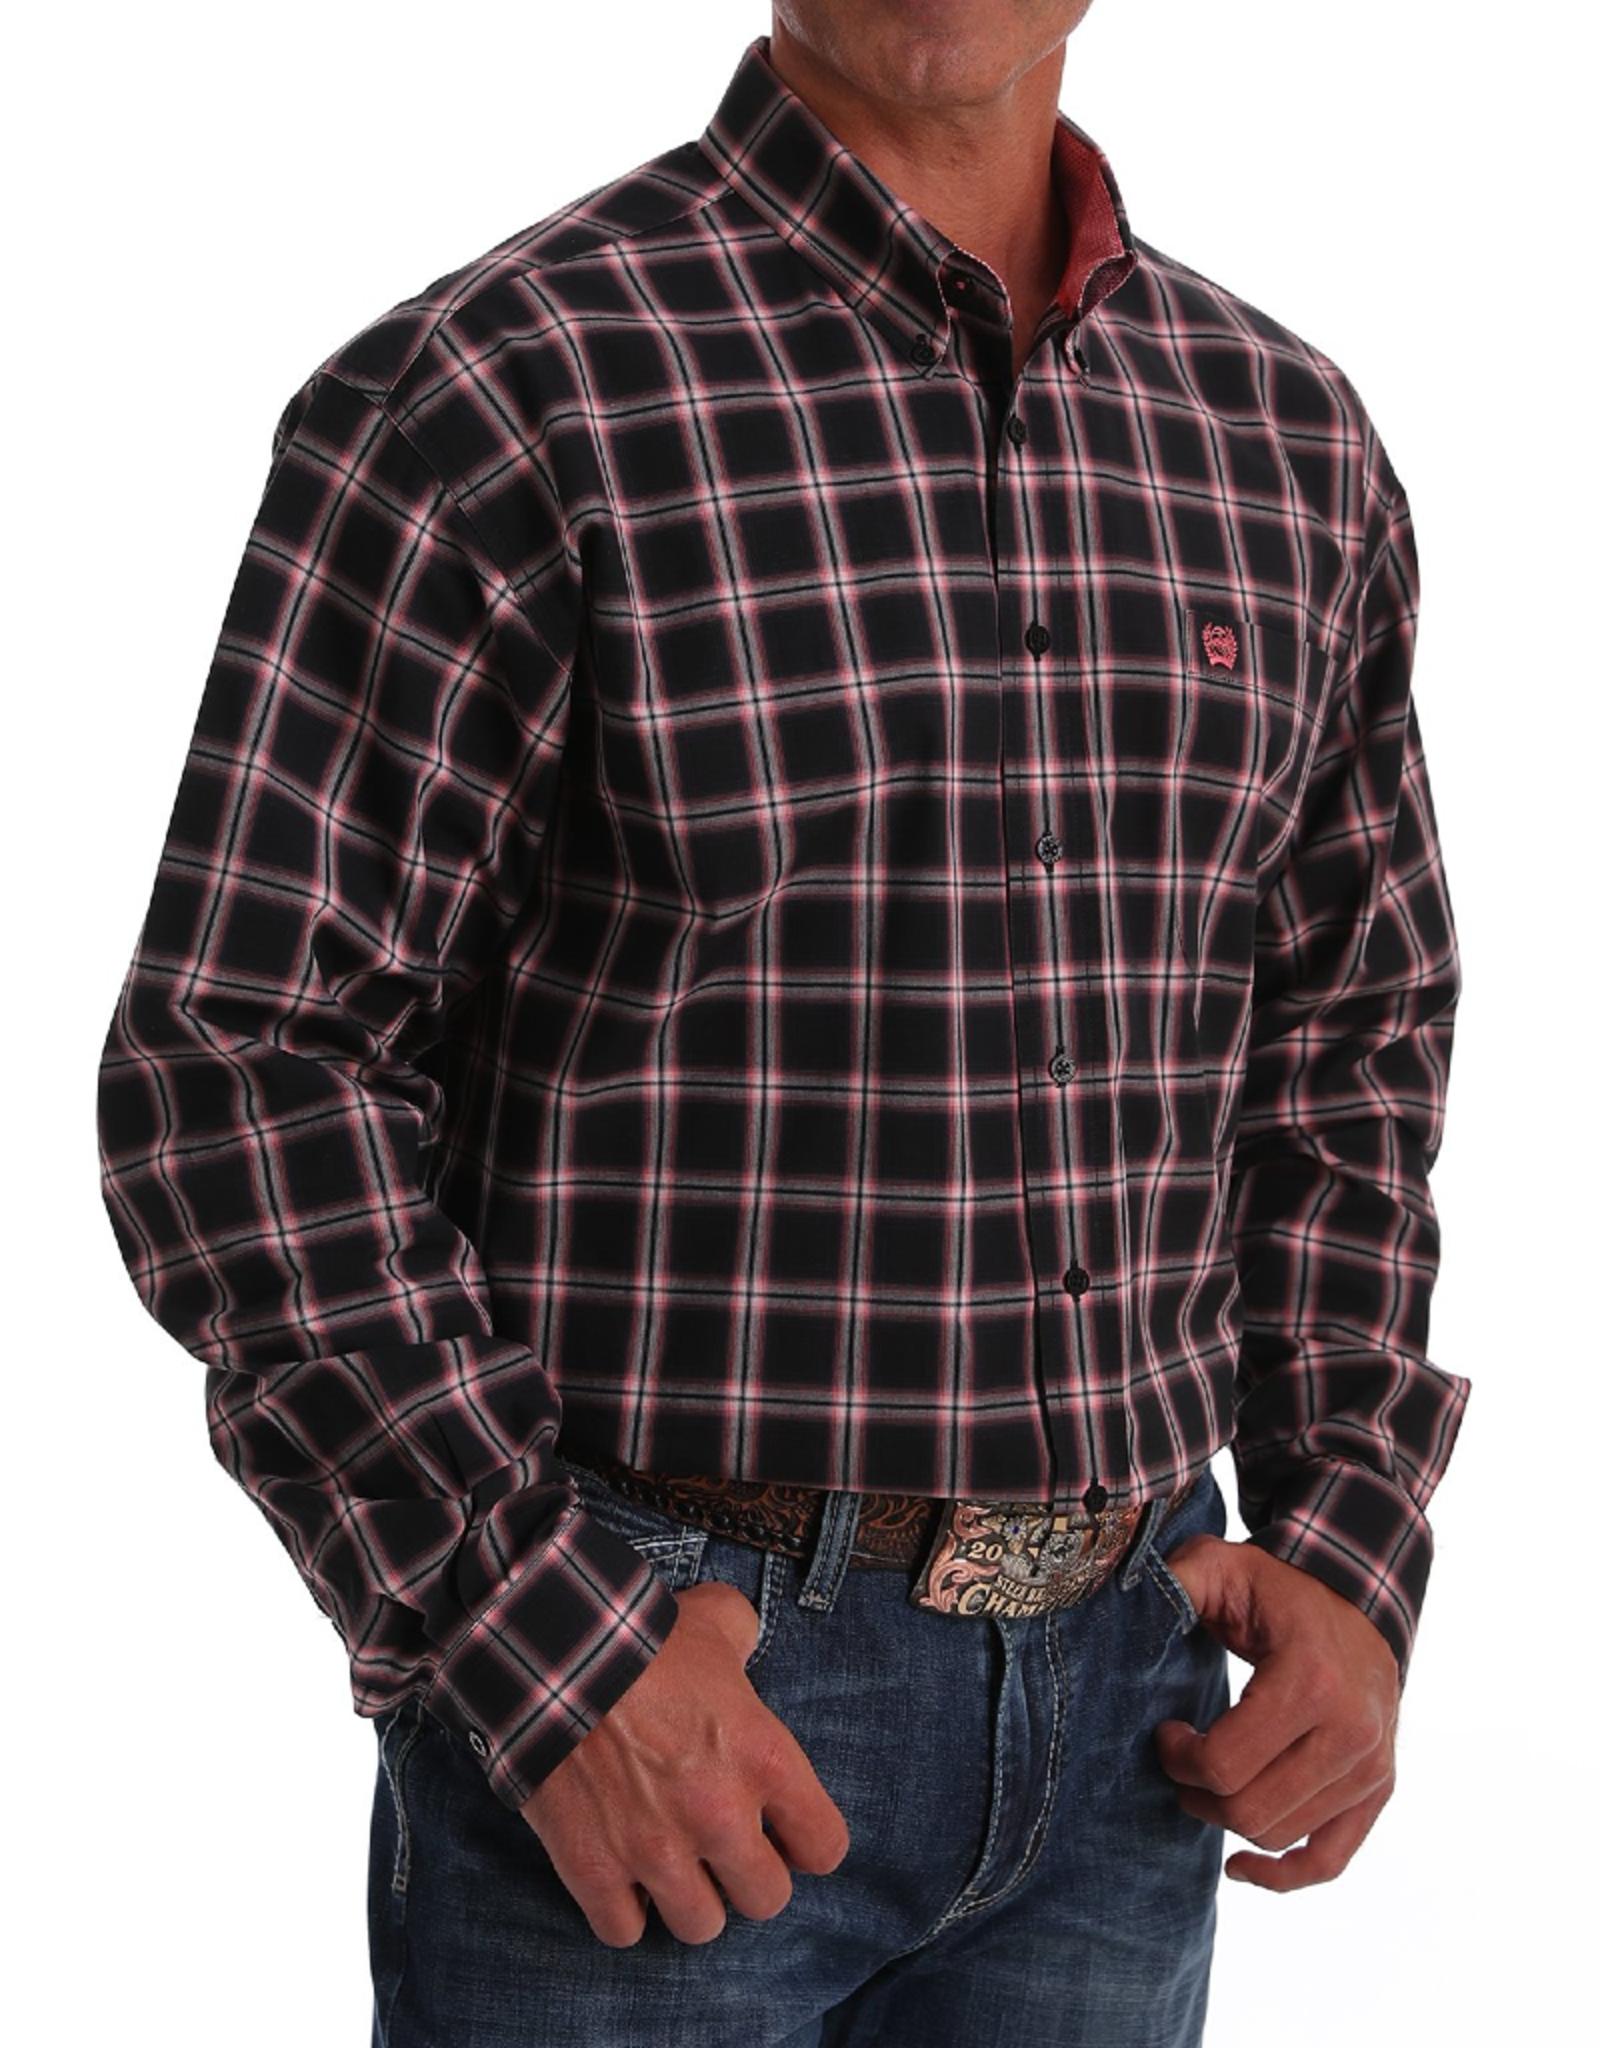 Cinch Cinch Classic Fit Plaid Shirt